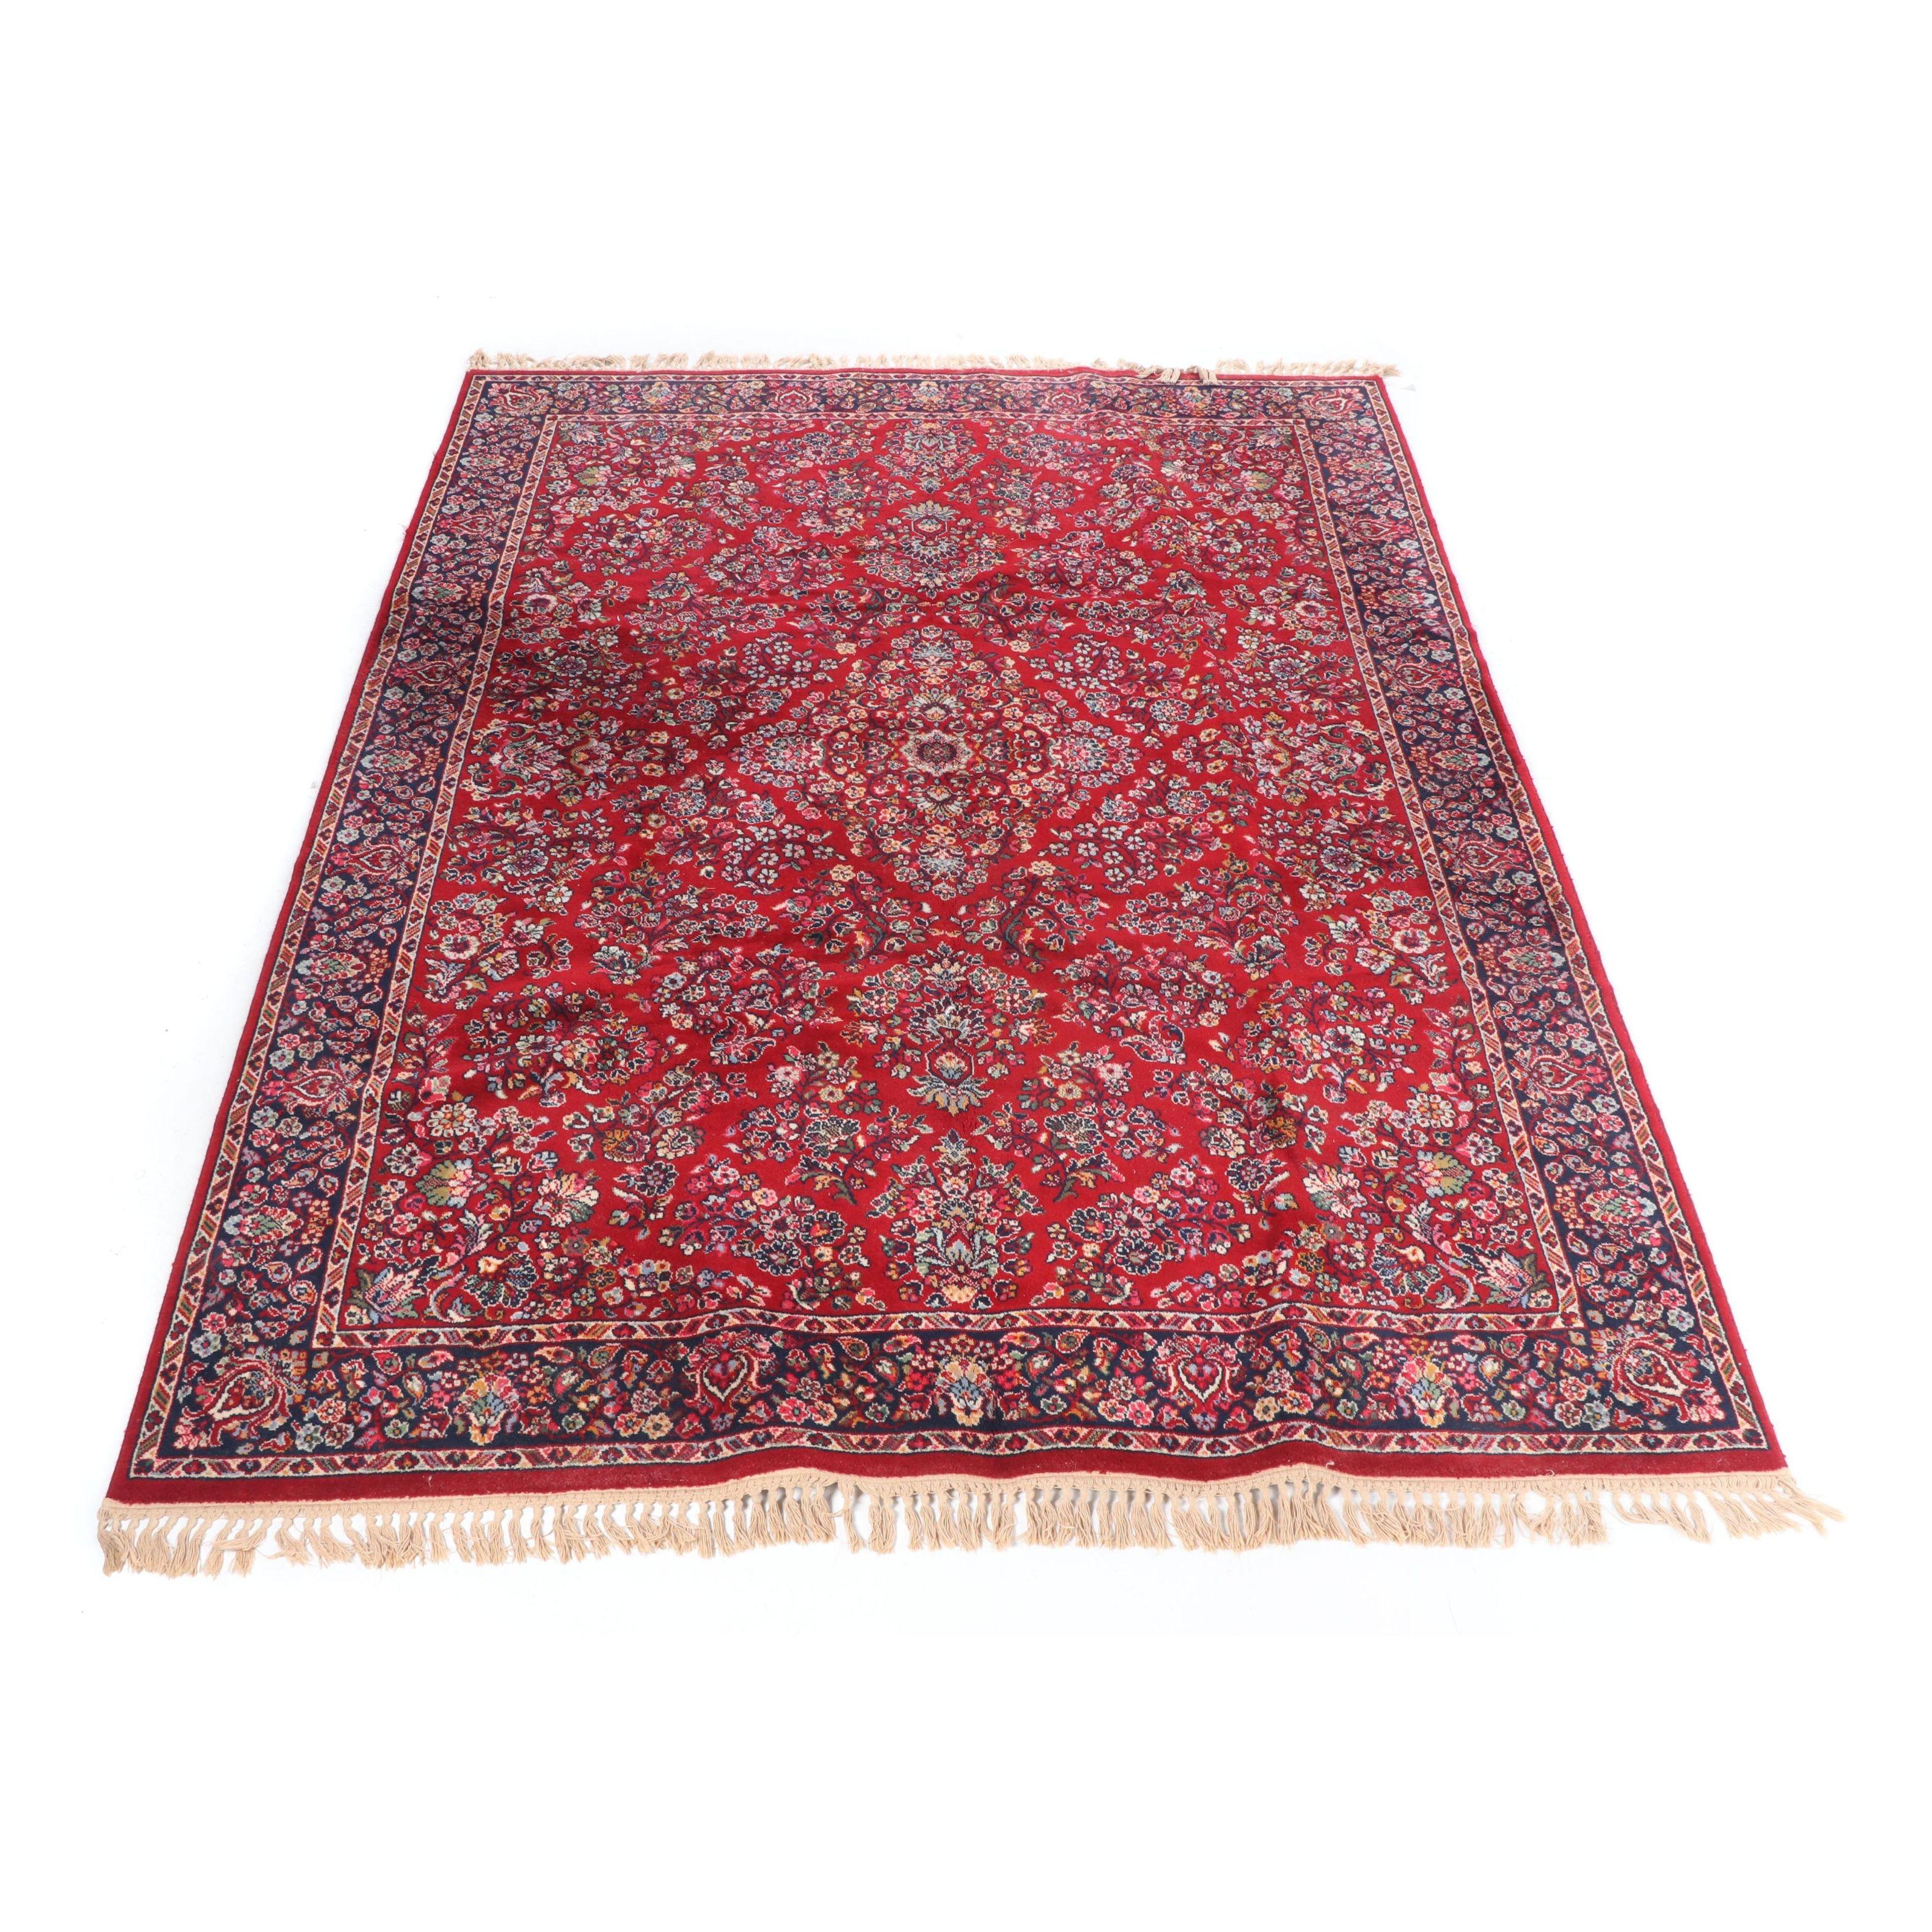 Machine Made Indian Kerman Wool Area Rug